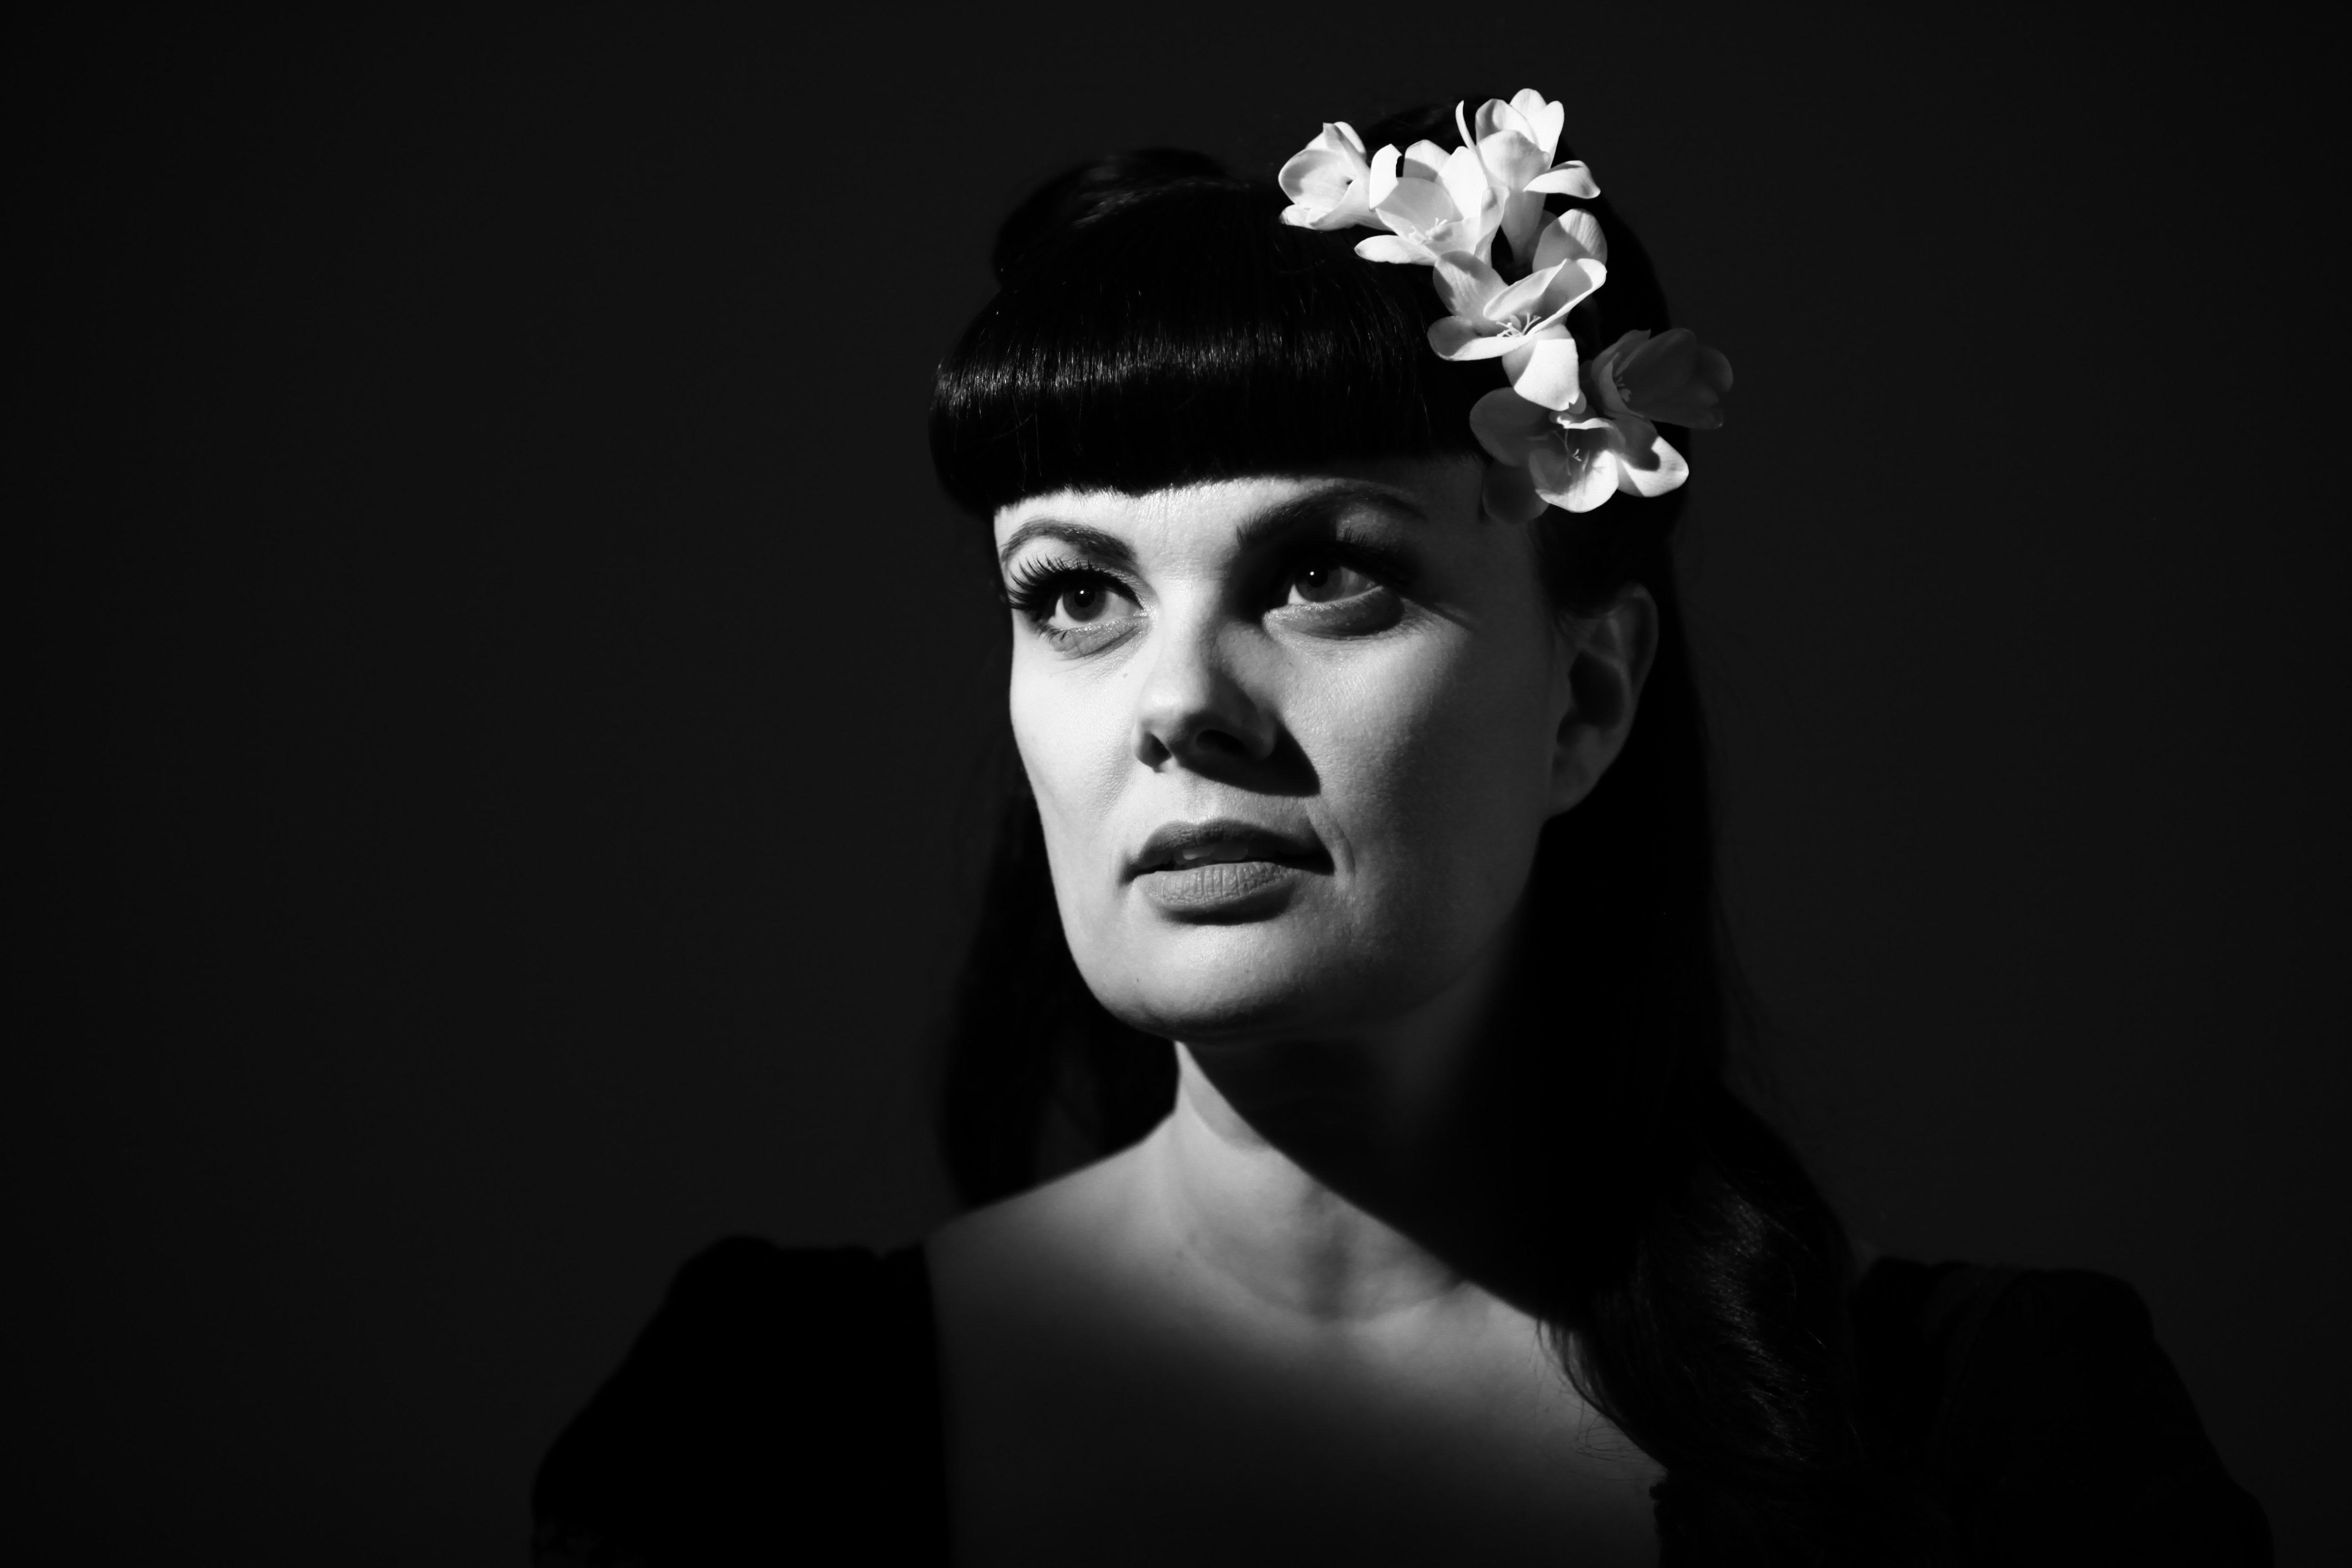 Canadian-born, New Zealand-based singer Tami Neilson